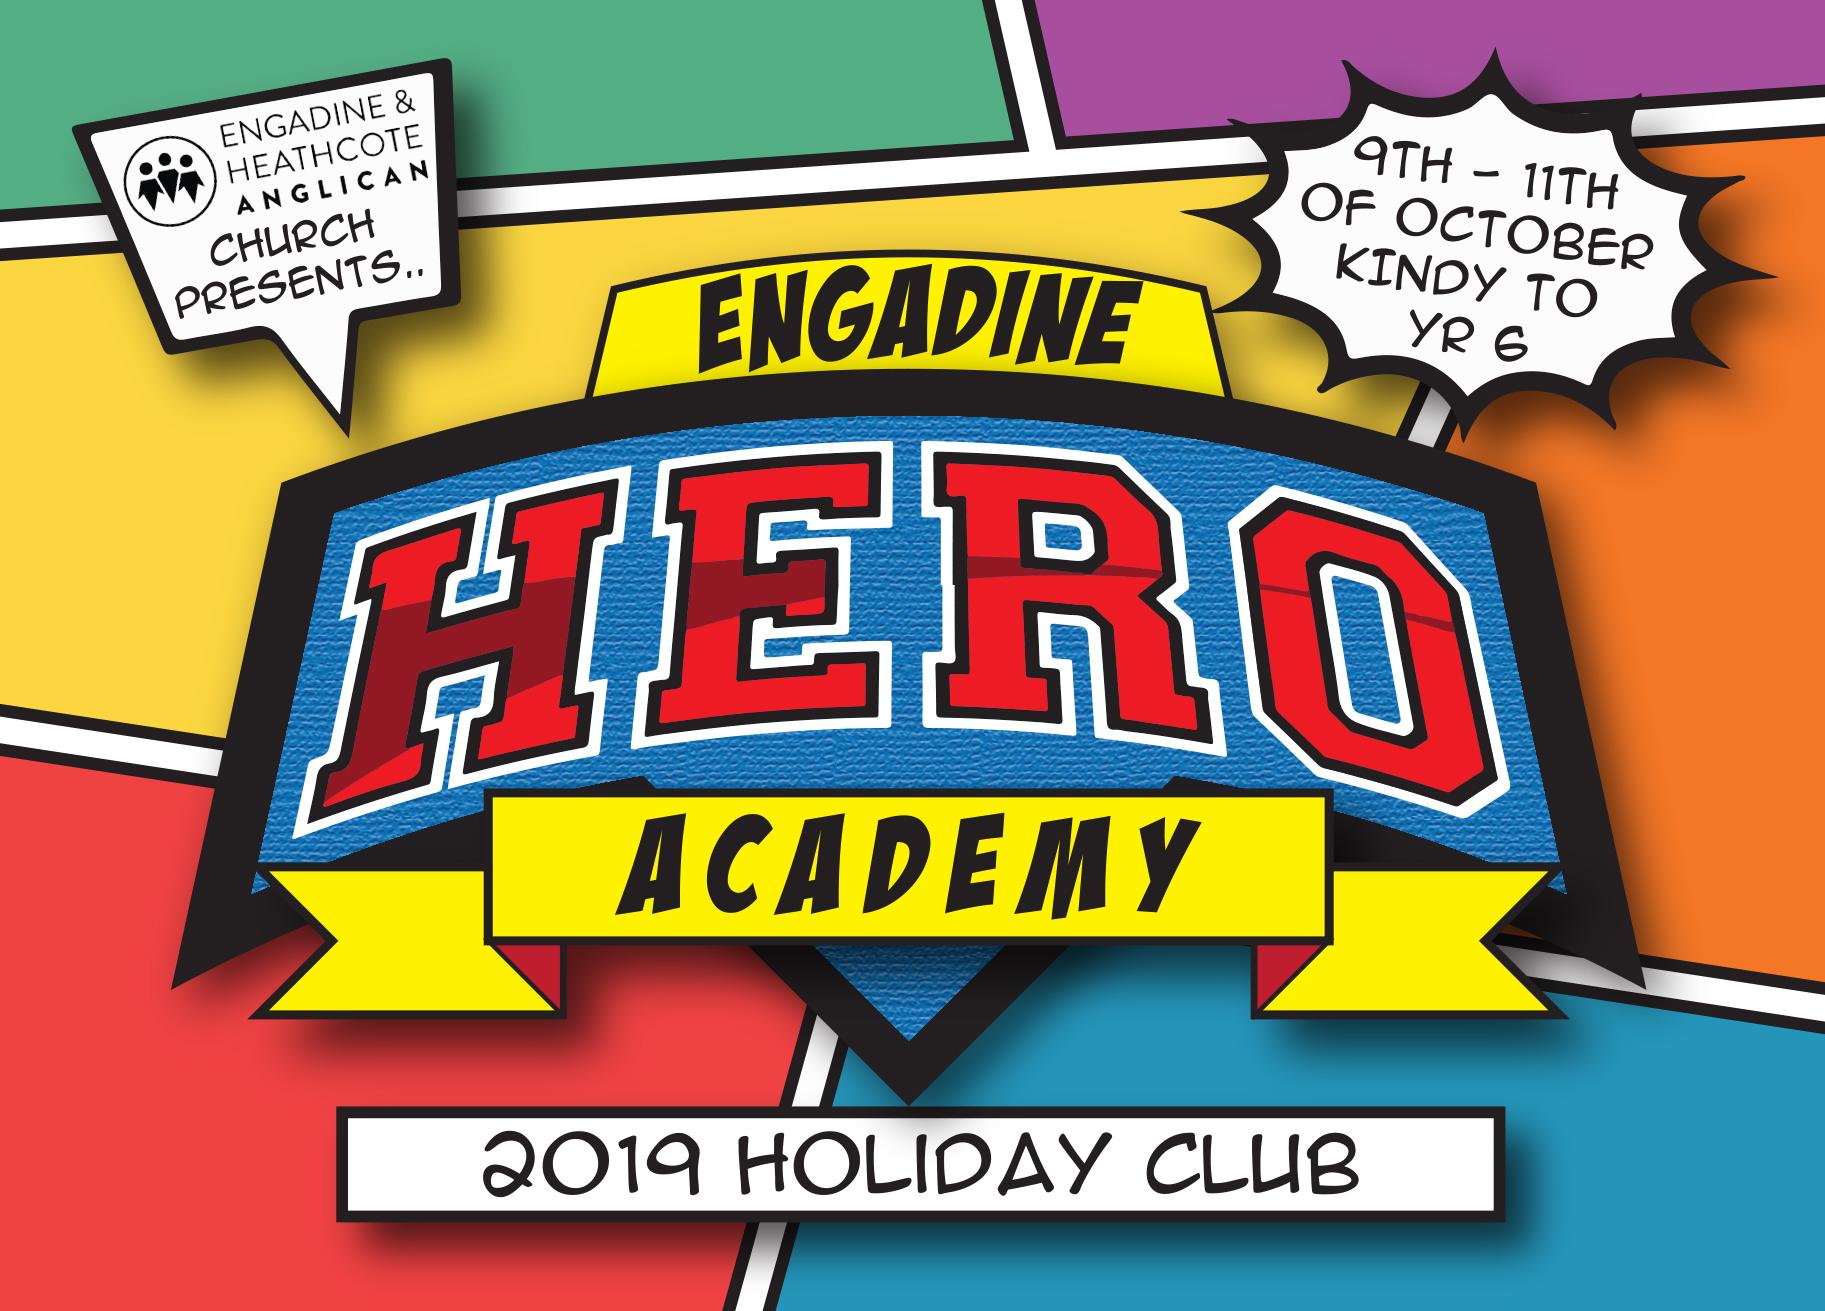 Engadine Hero Academy Postcard Front.jpg